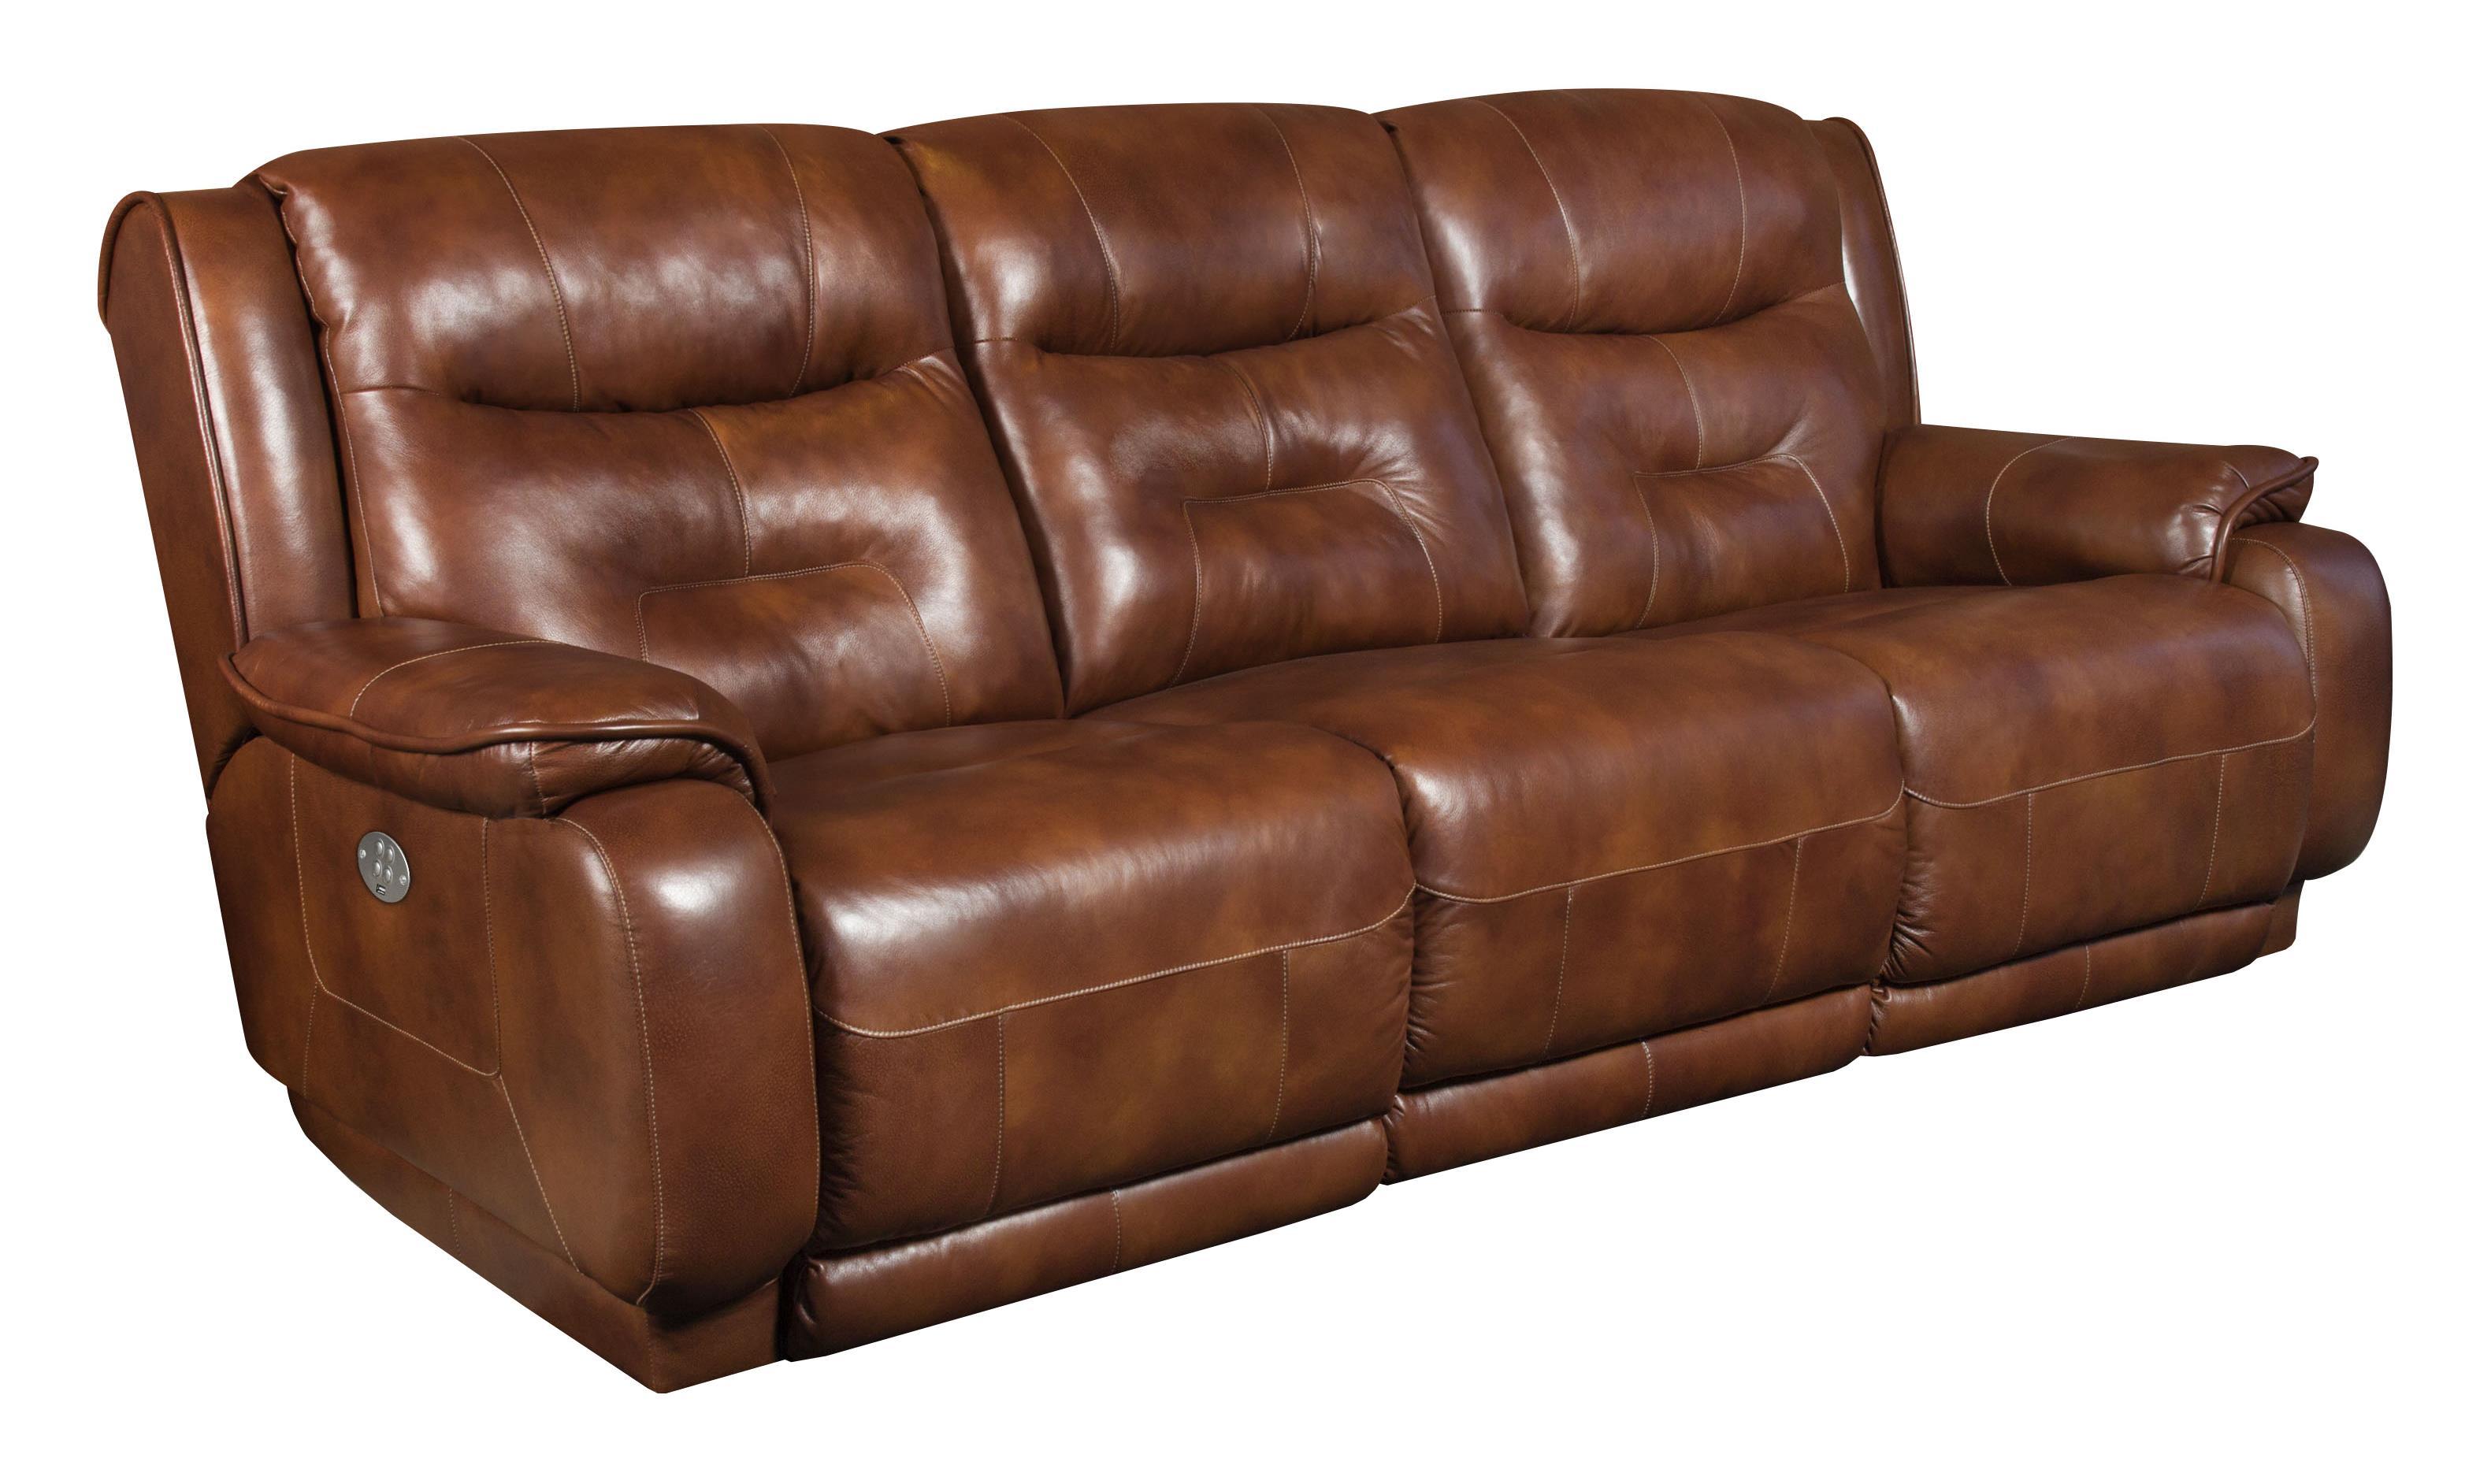 southern motion velocity reclining sofa restoration hardware sleeper clearance grand slam 864 61mp